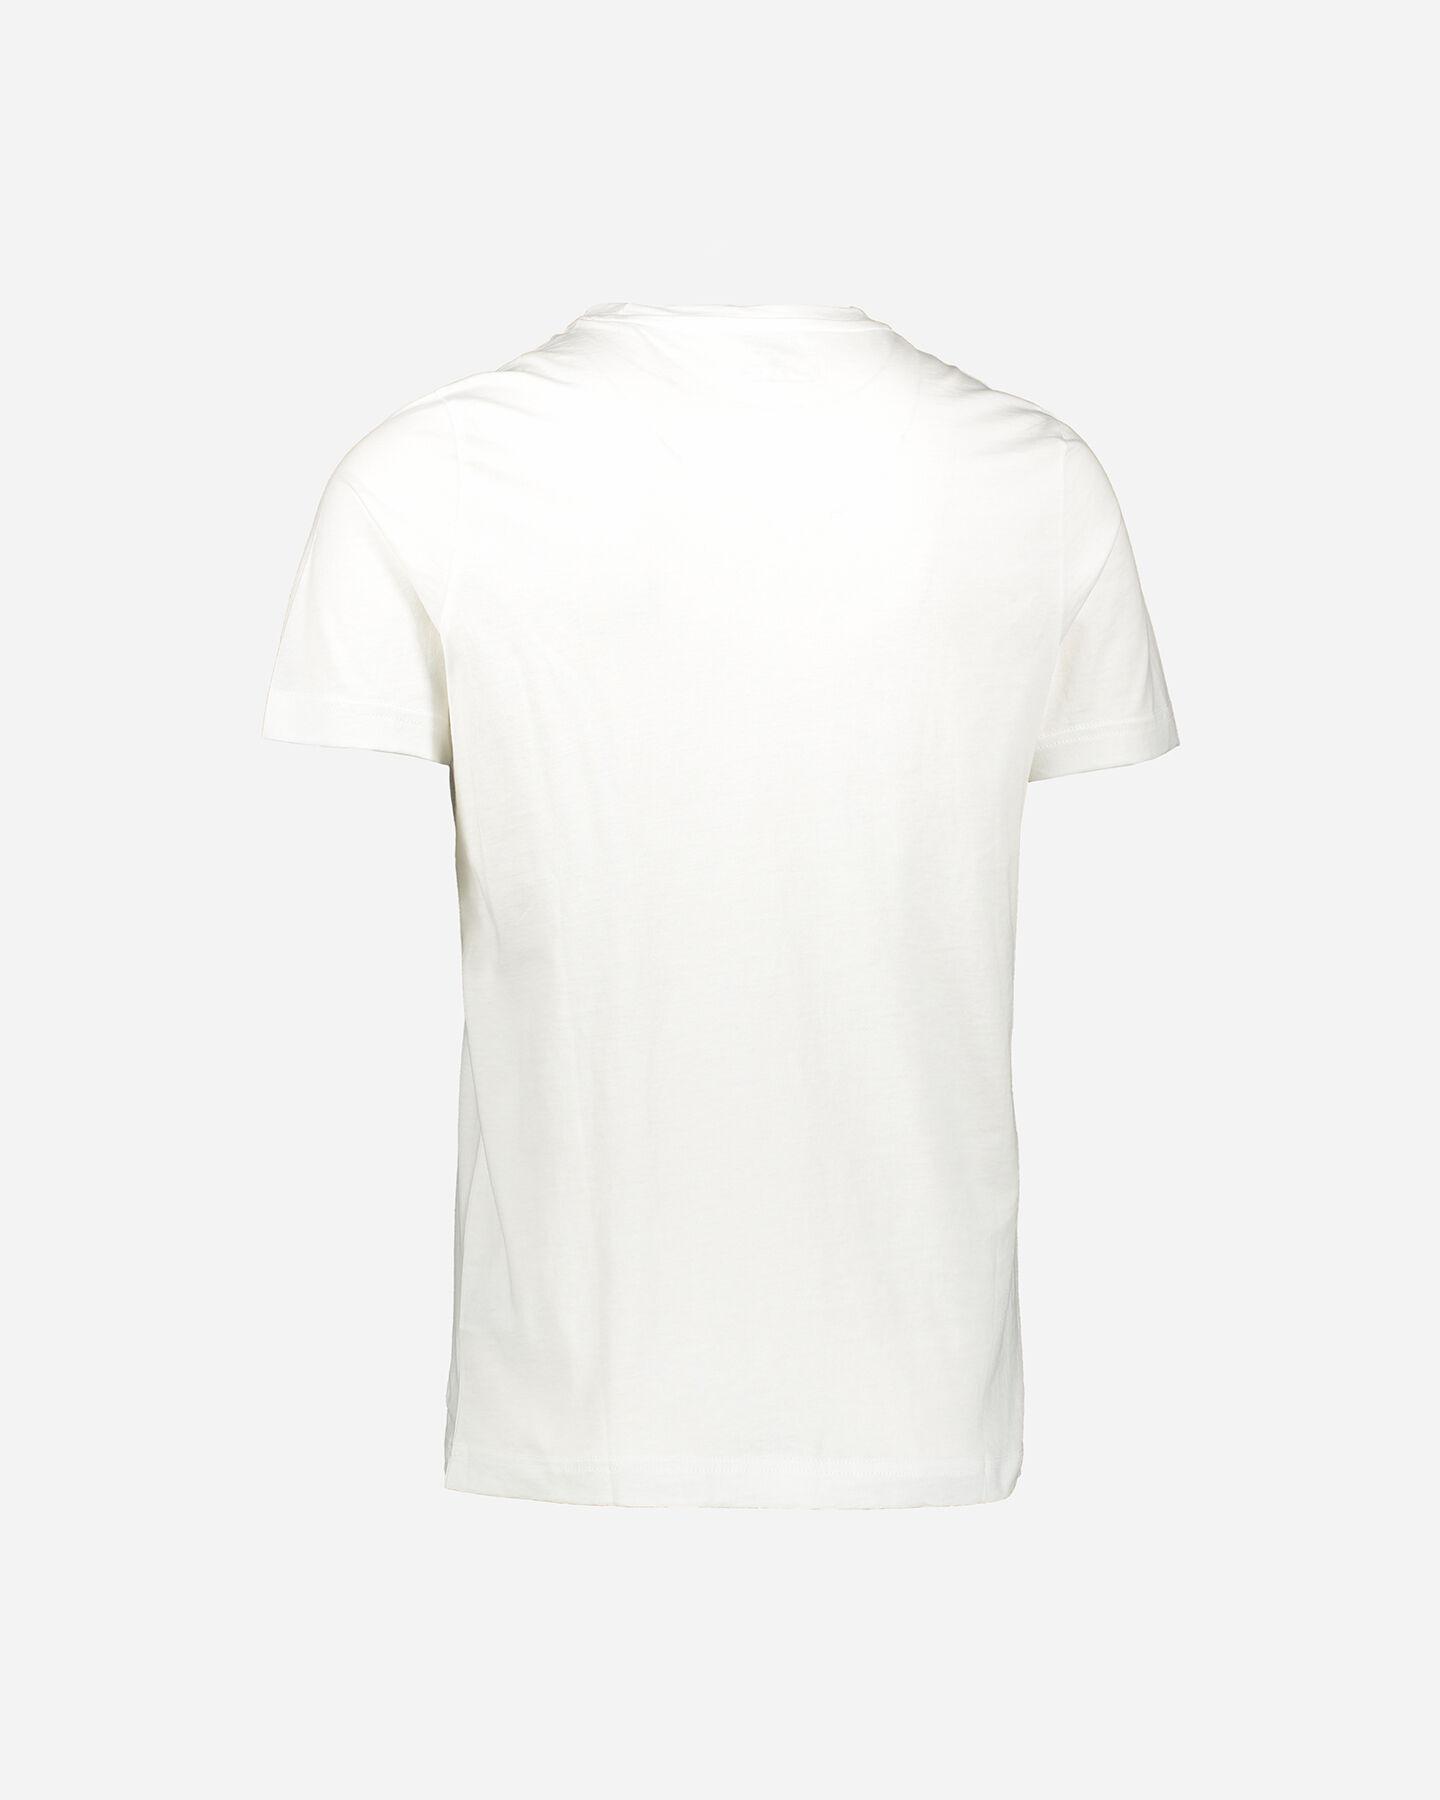 T-Shirt REEBOK CLASSIC LOGO M S5280183 scatto 1